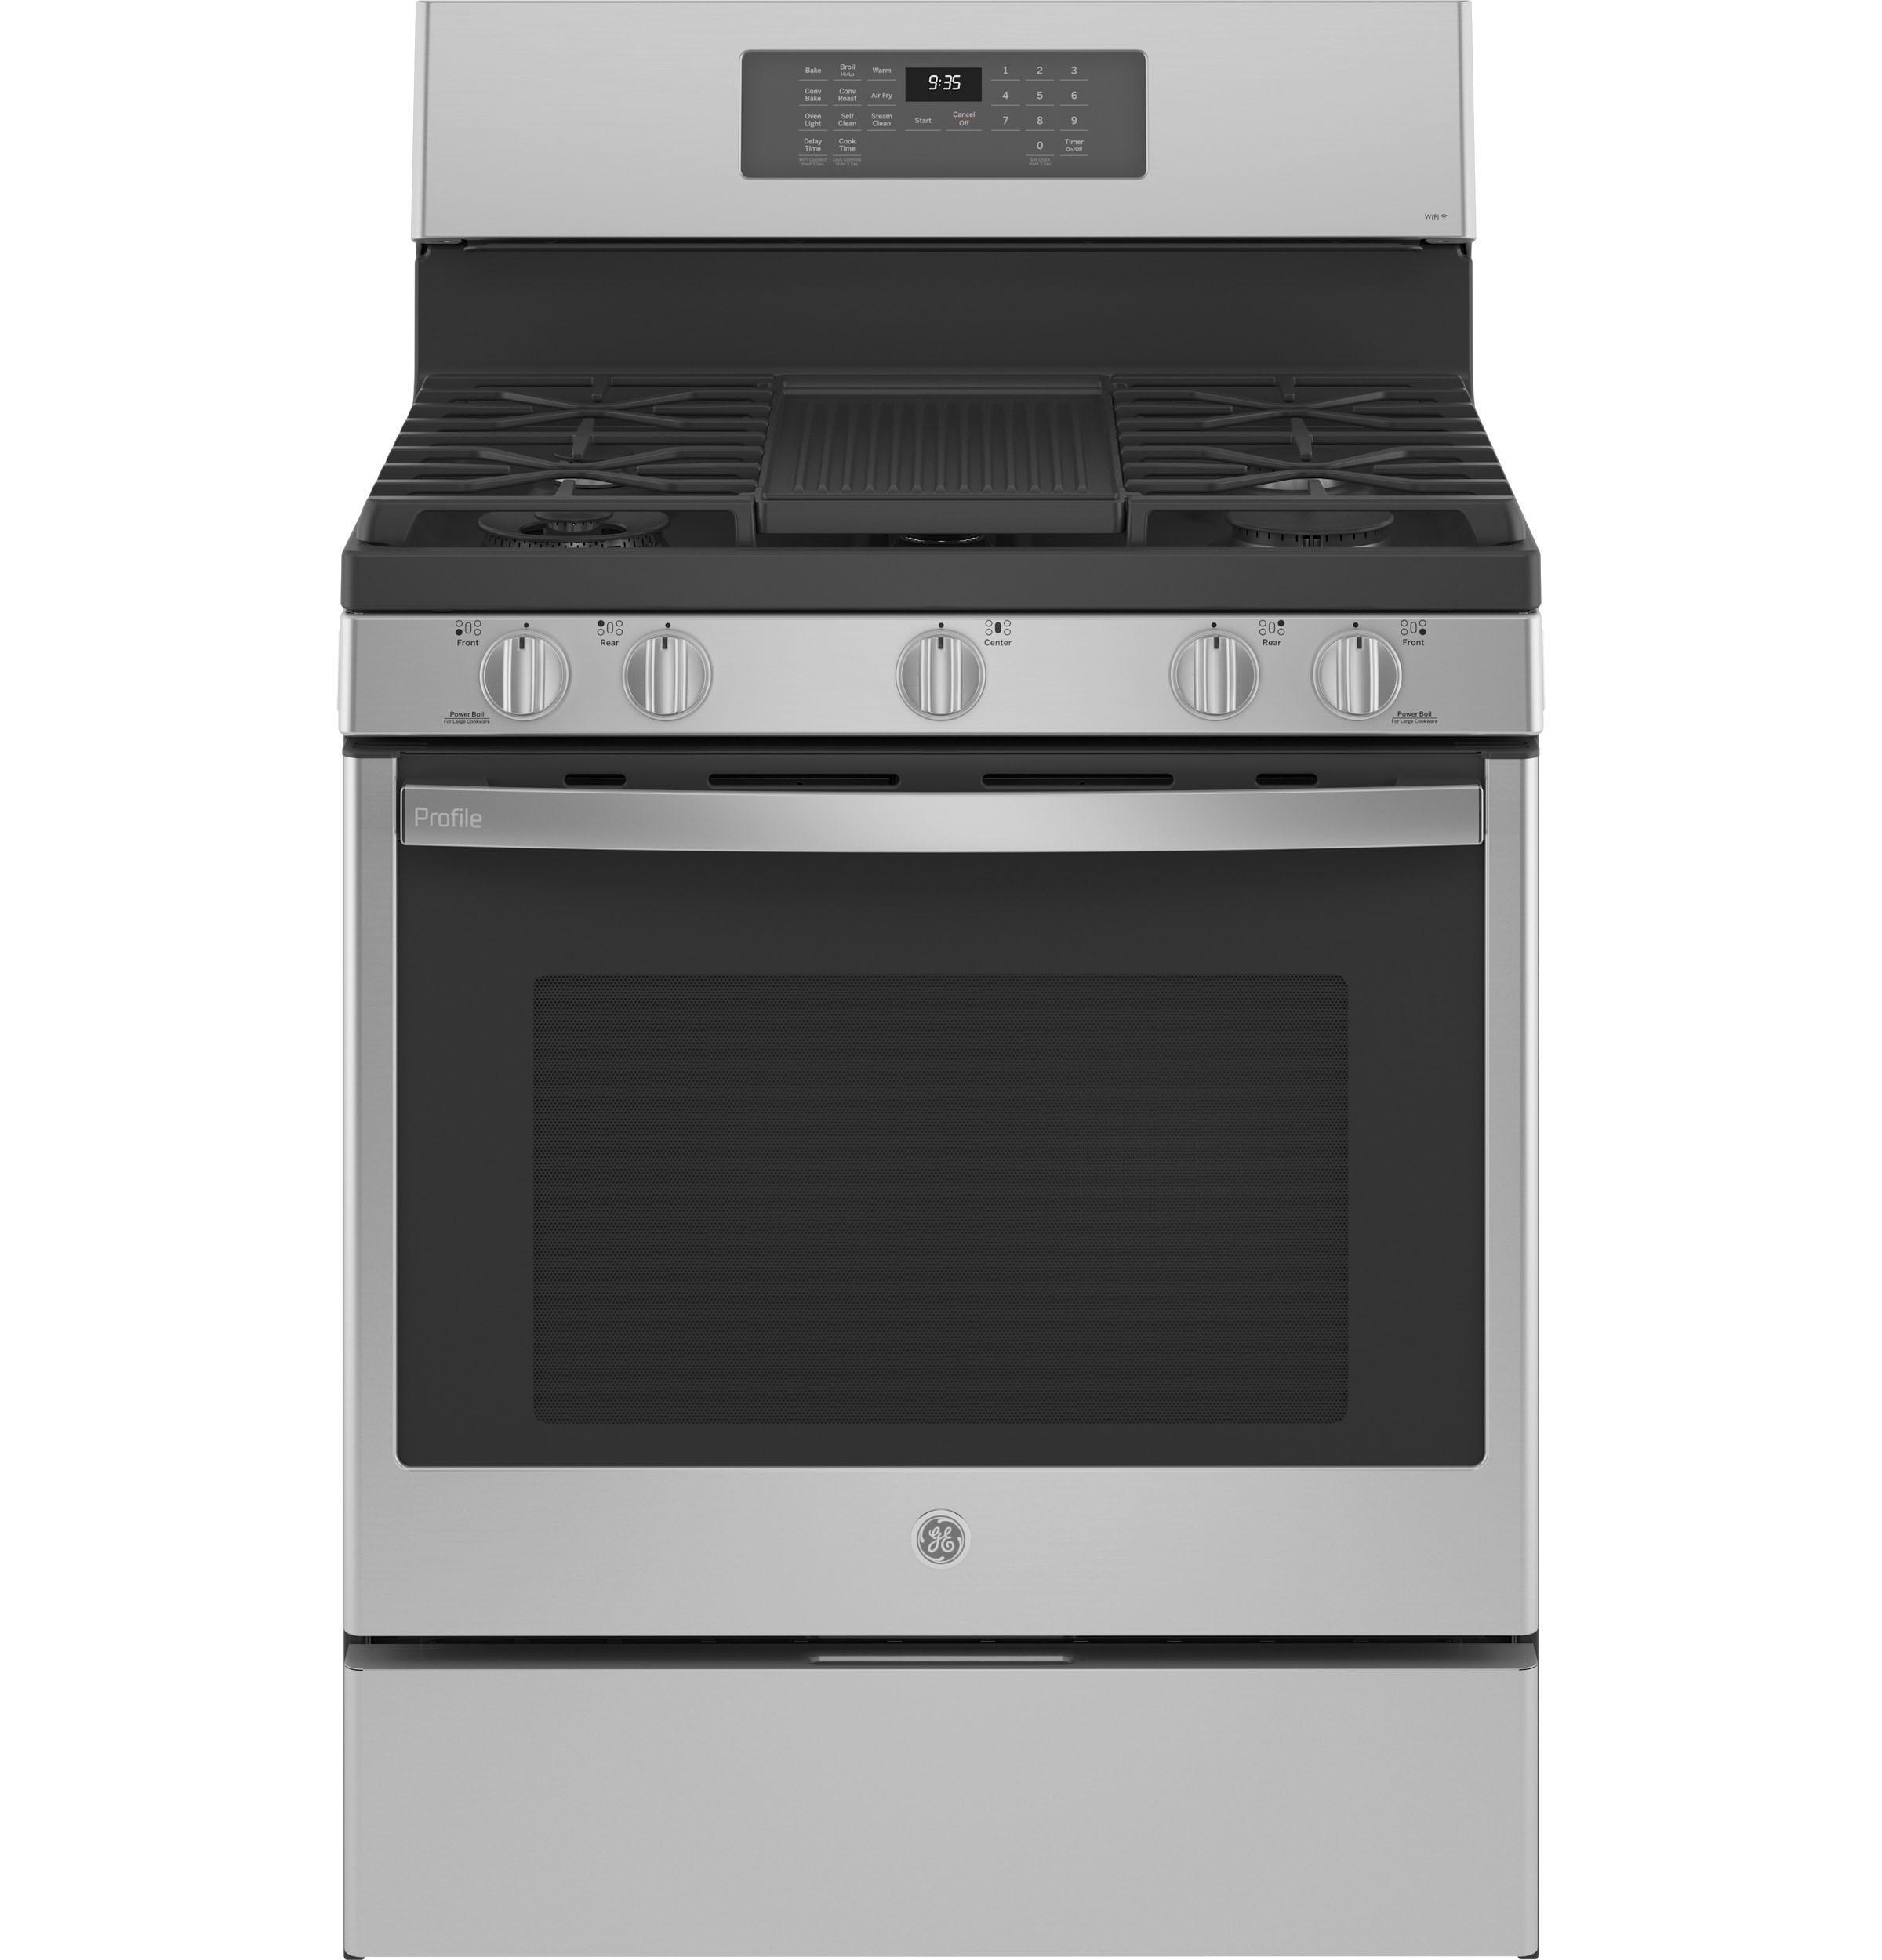 "GE Profile GE Profile™ 30"" Free-Standing Self Clean Gas Fingerprint Resistant Range with Air Fry"